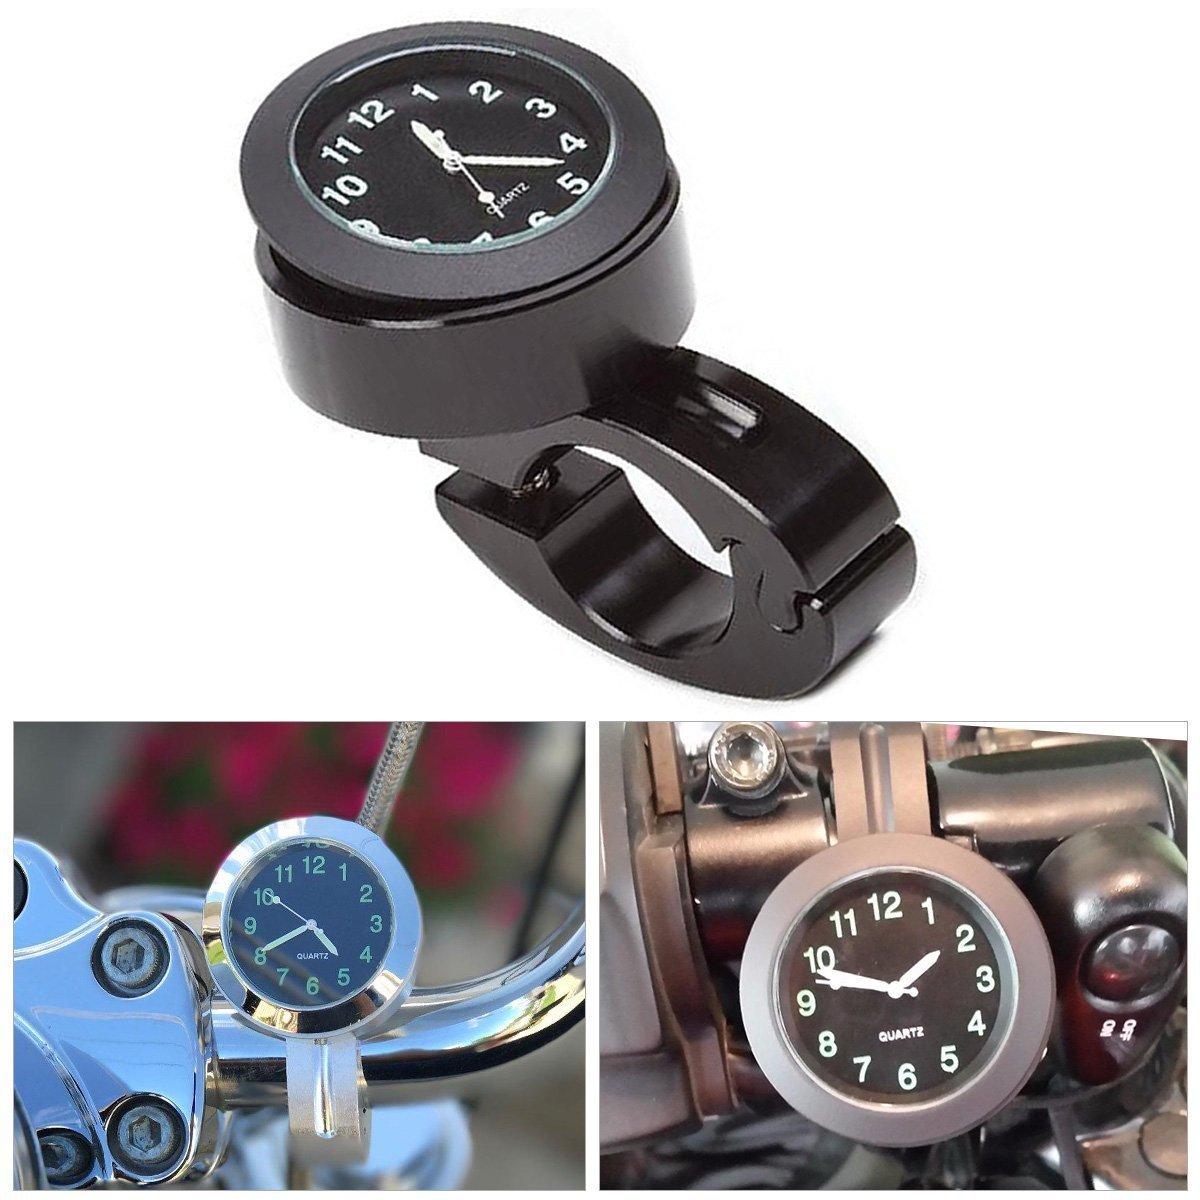 Yooap Moto Guidon Horloge 7/8 Pouces Universel Impermé able Moto Guidon Horloge Yamaha Kawasaki Honda Suzuki Harley Davidson (Noir) (Moto Horloge)